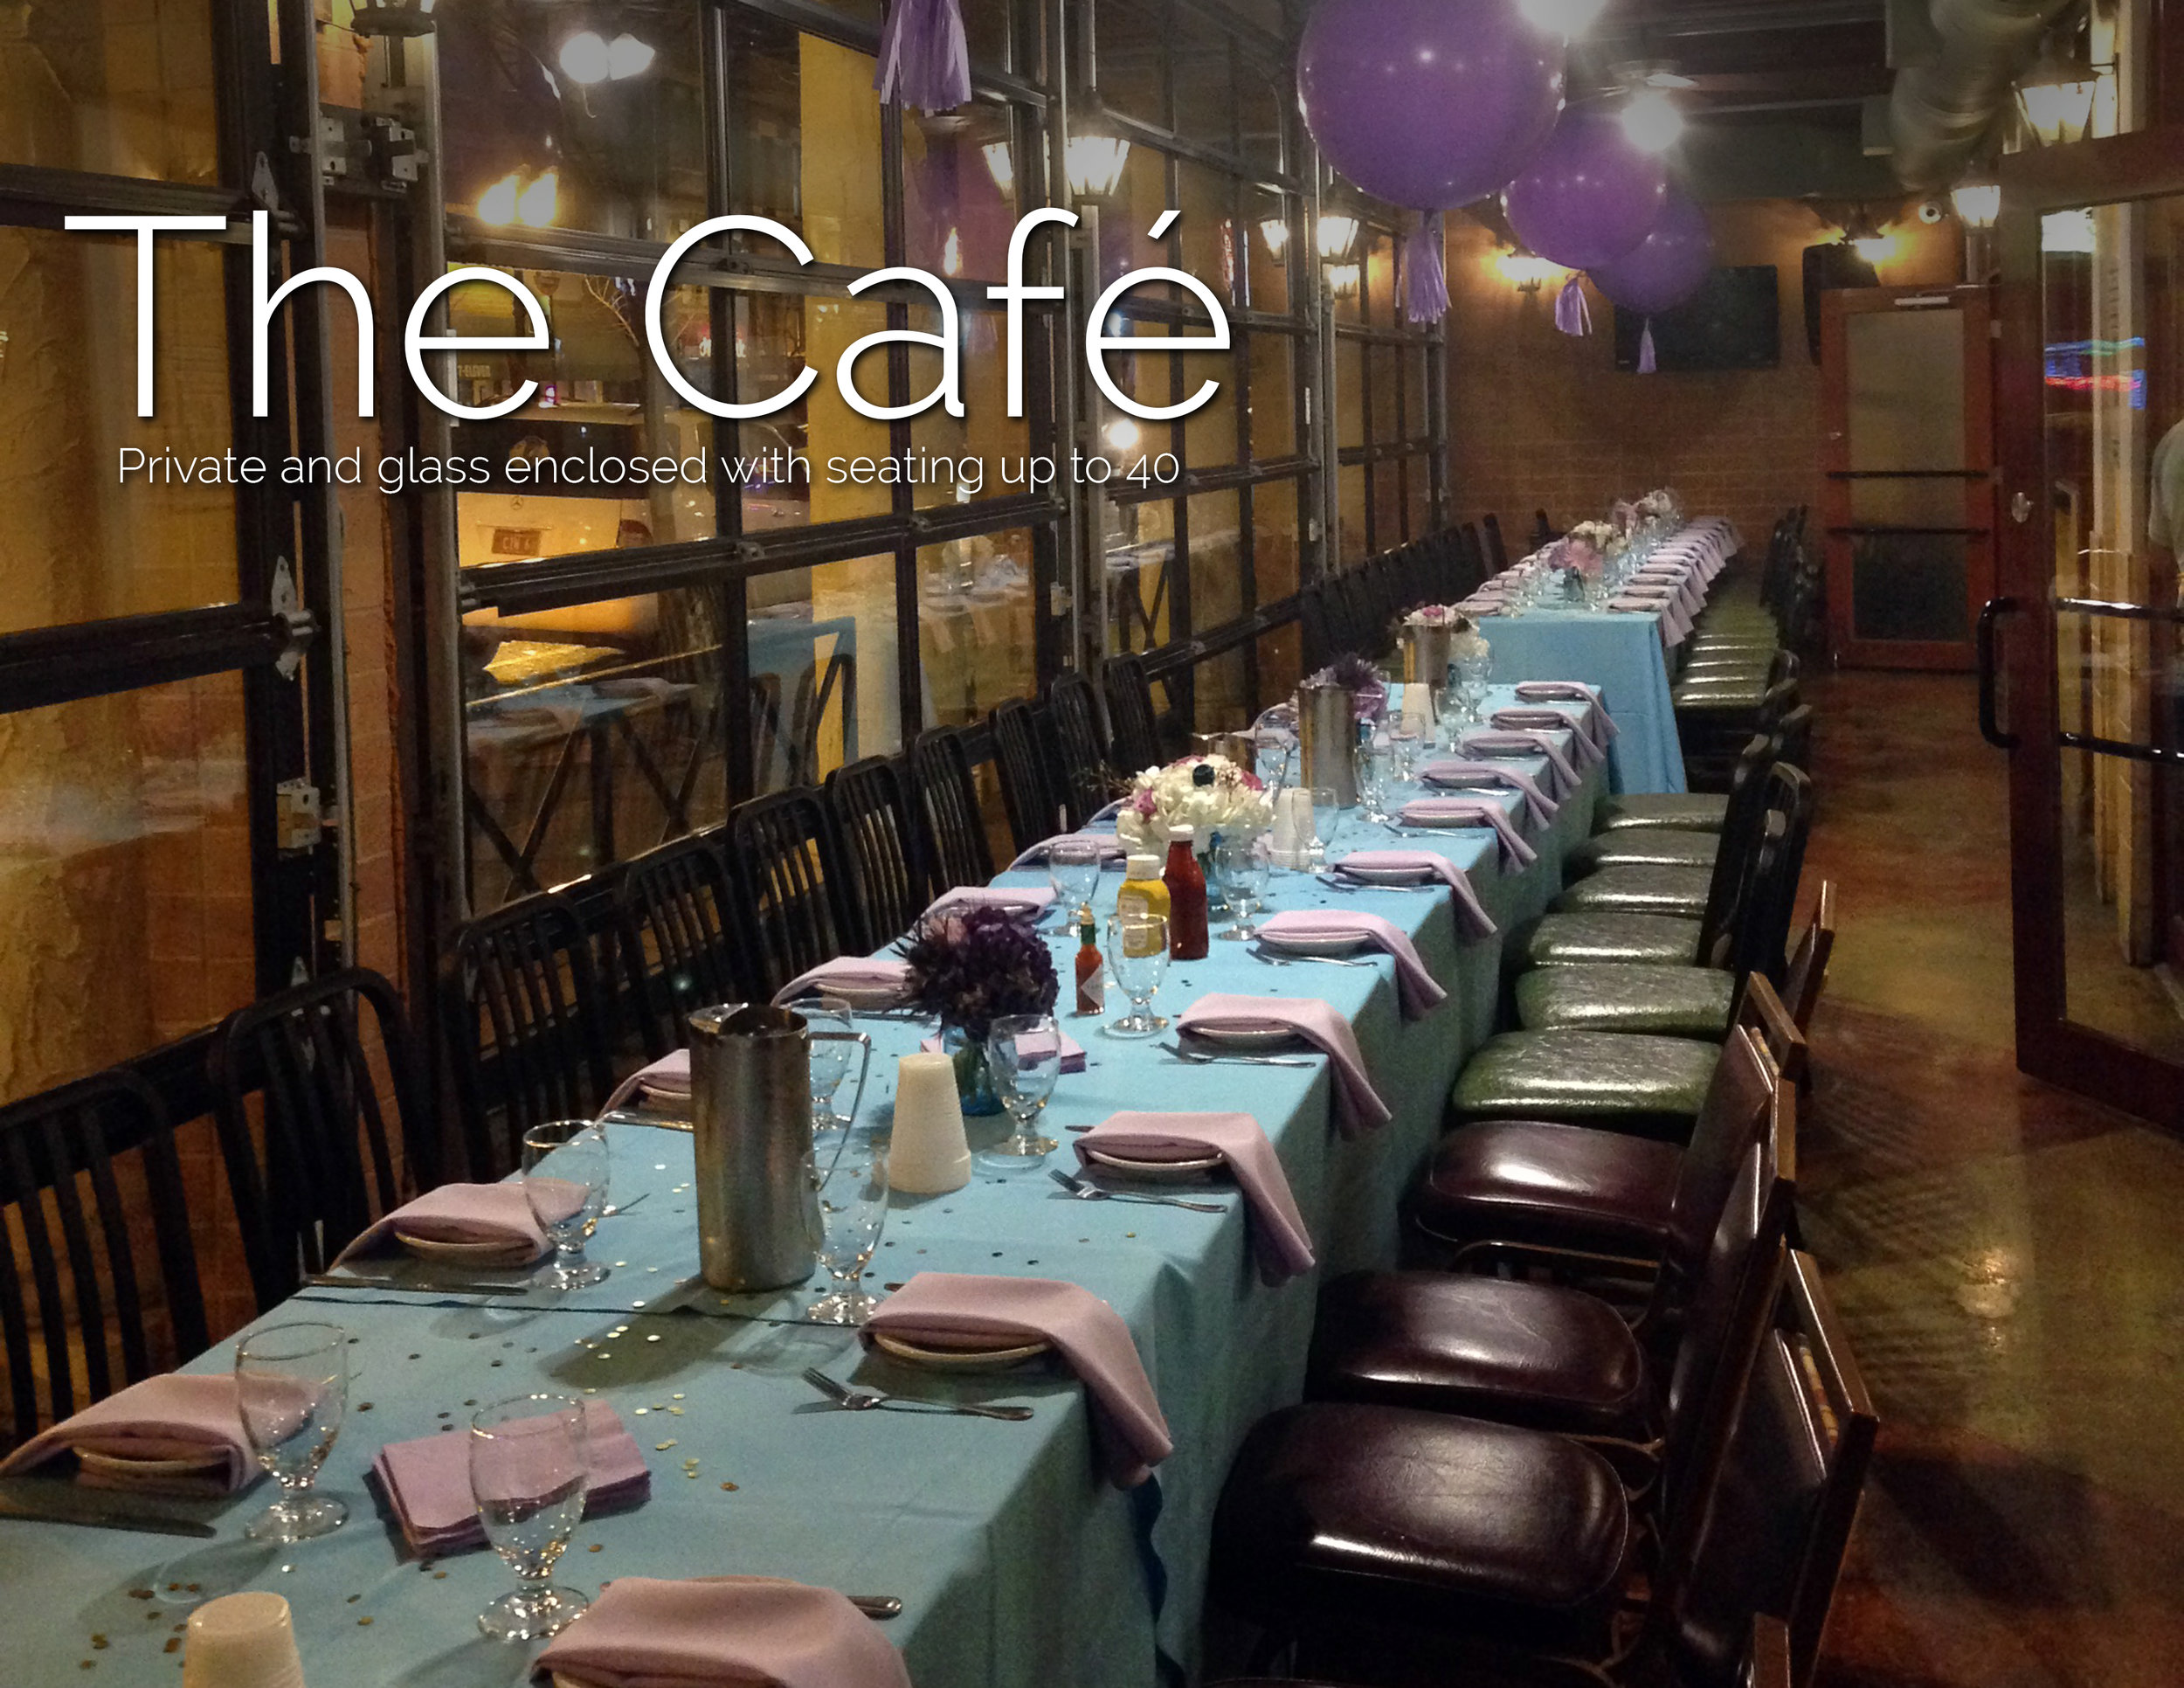 Cafe_RoomPic.jpg